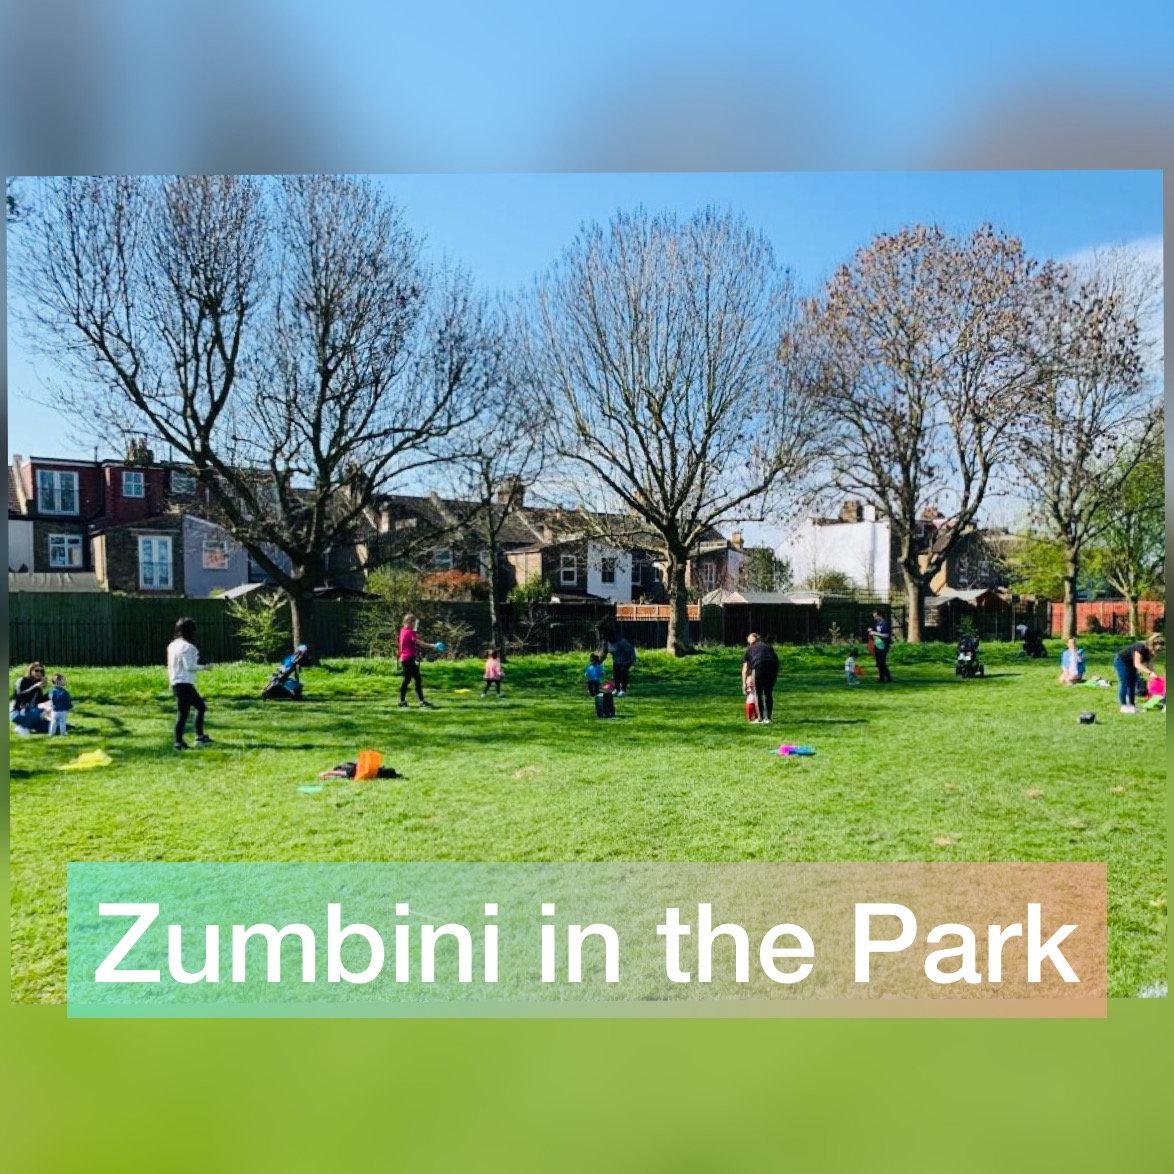 Zumbini in the Park